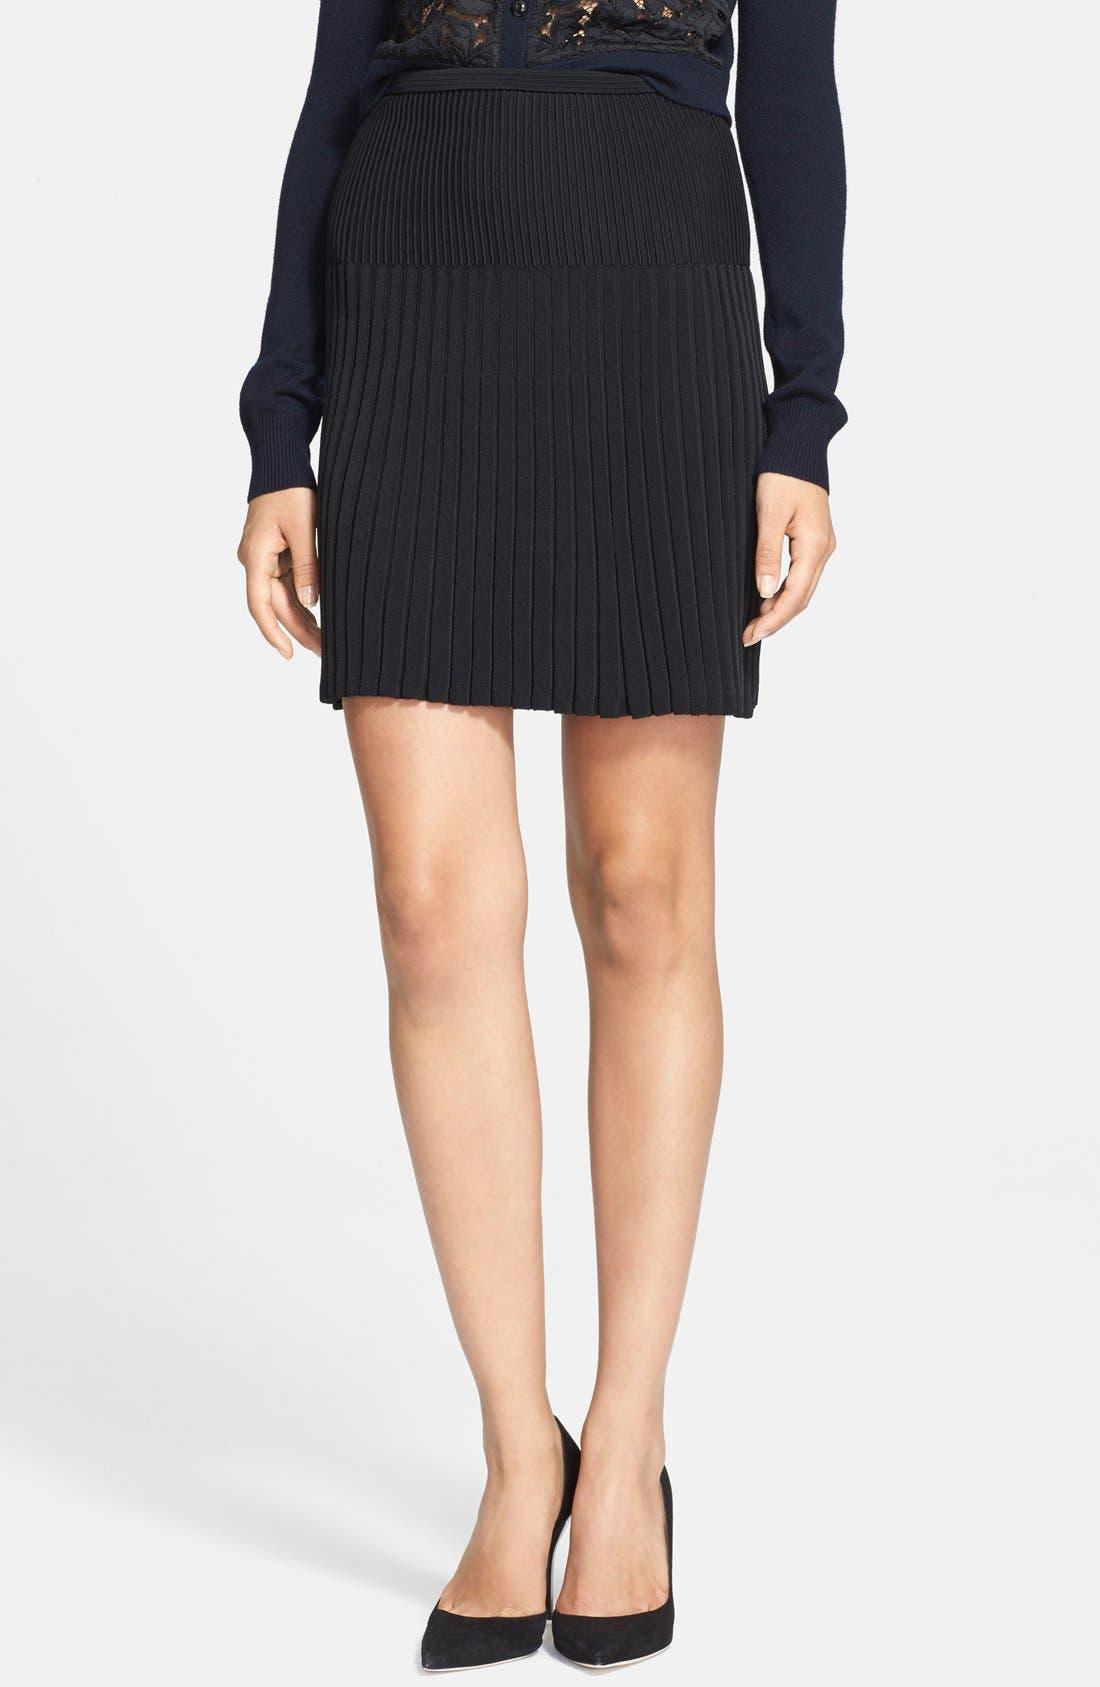 Alternate Image 1 Selected - Diane von Furstenberg 'Mara' Skirt